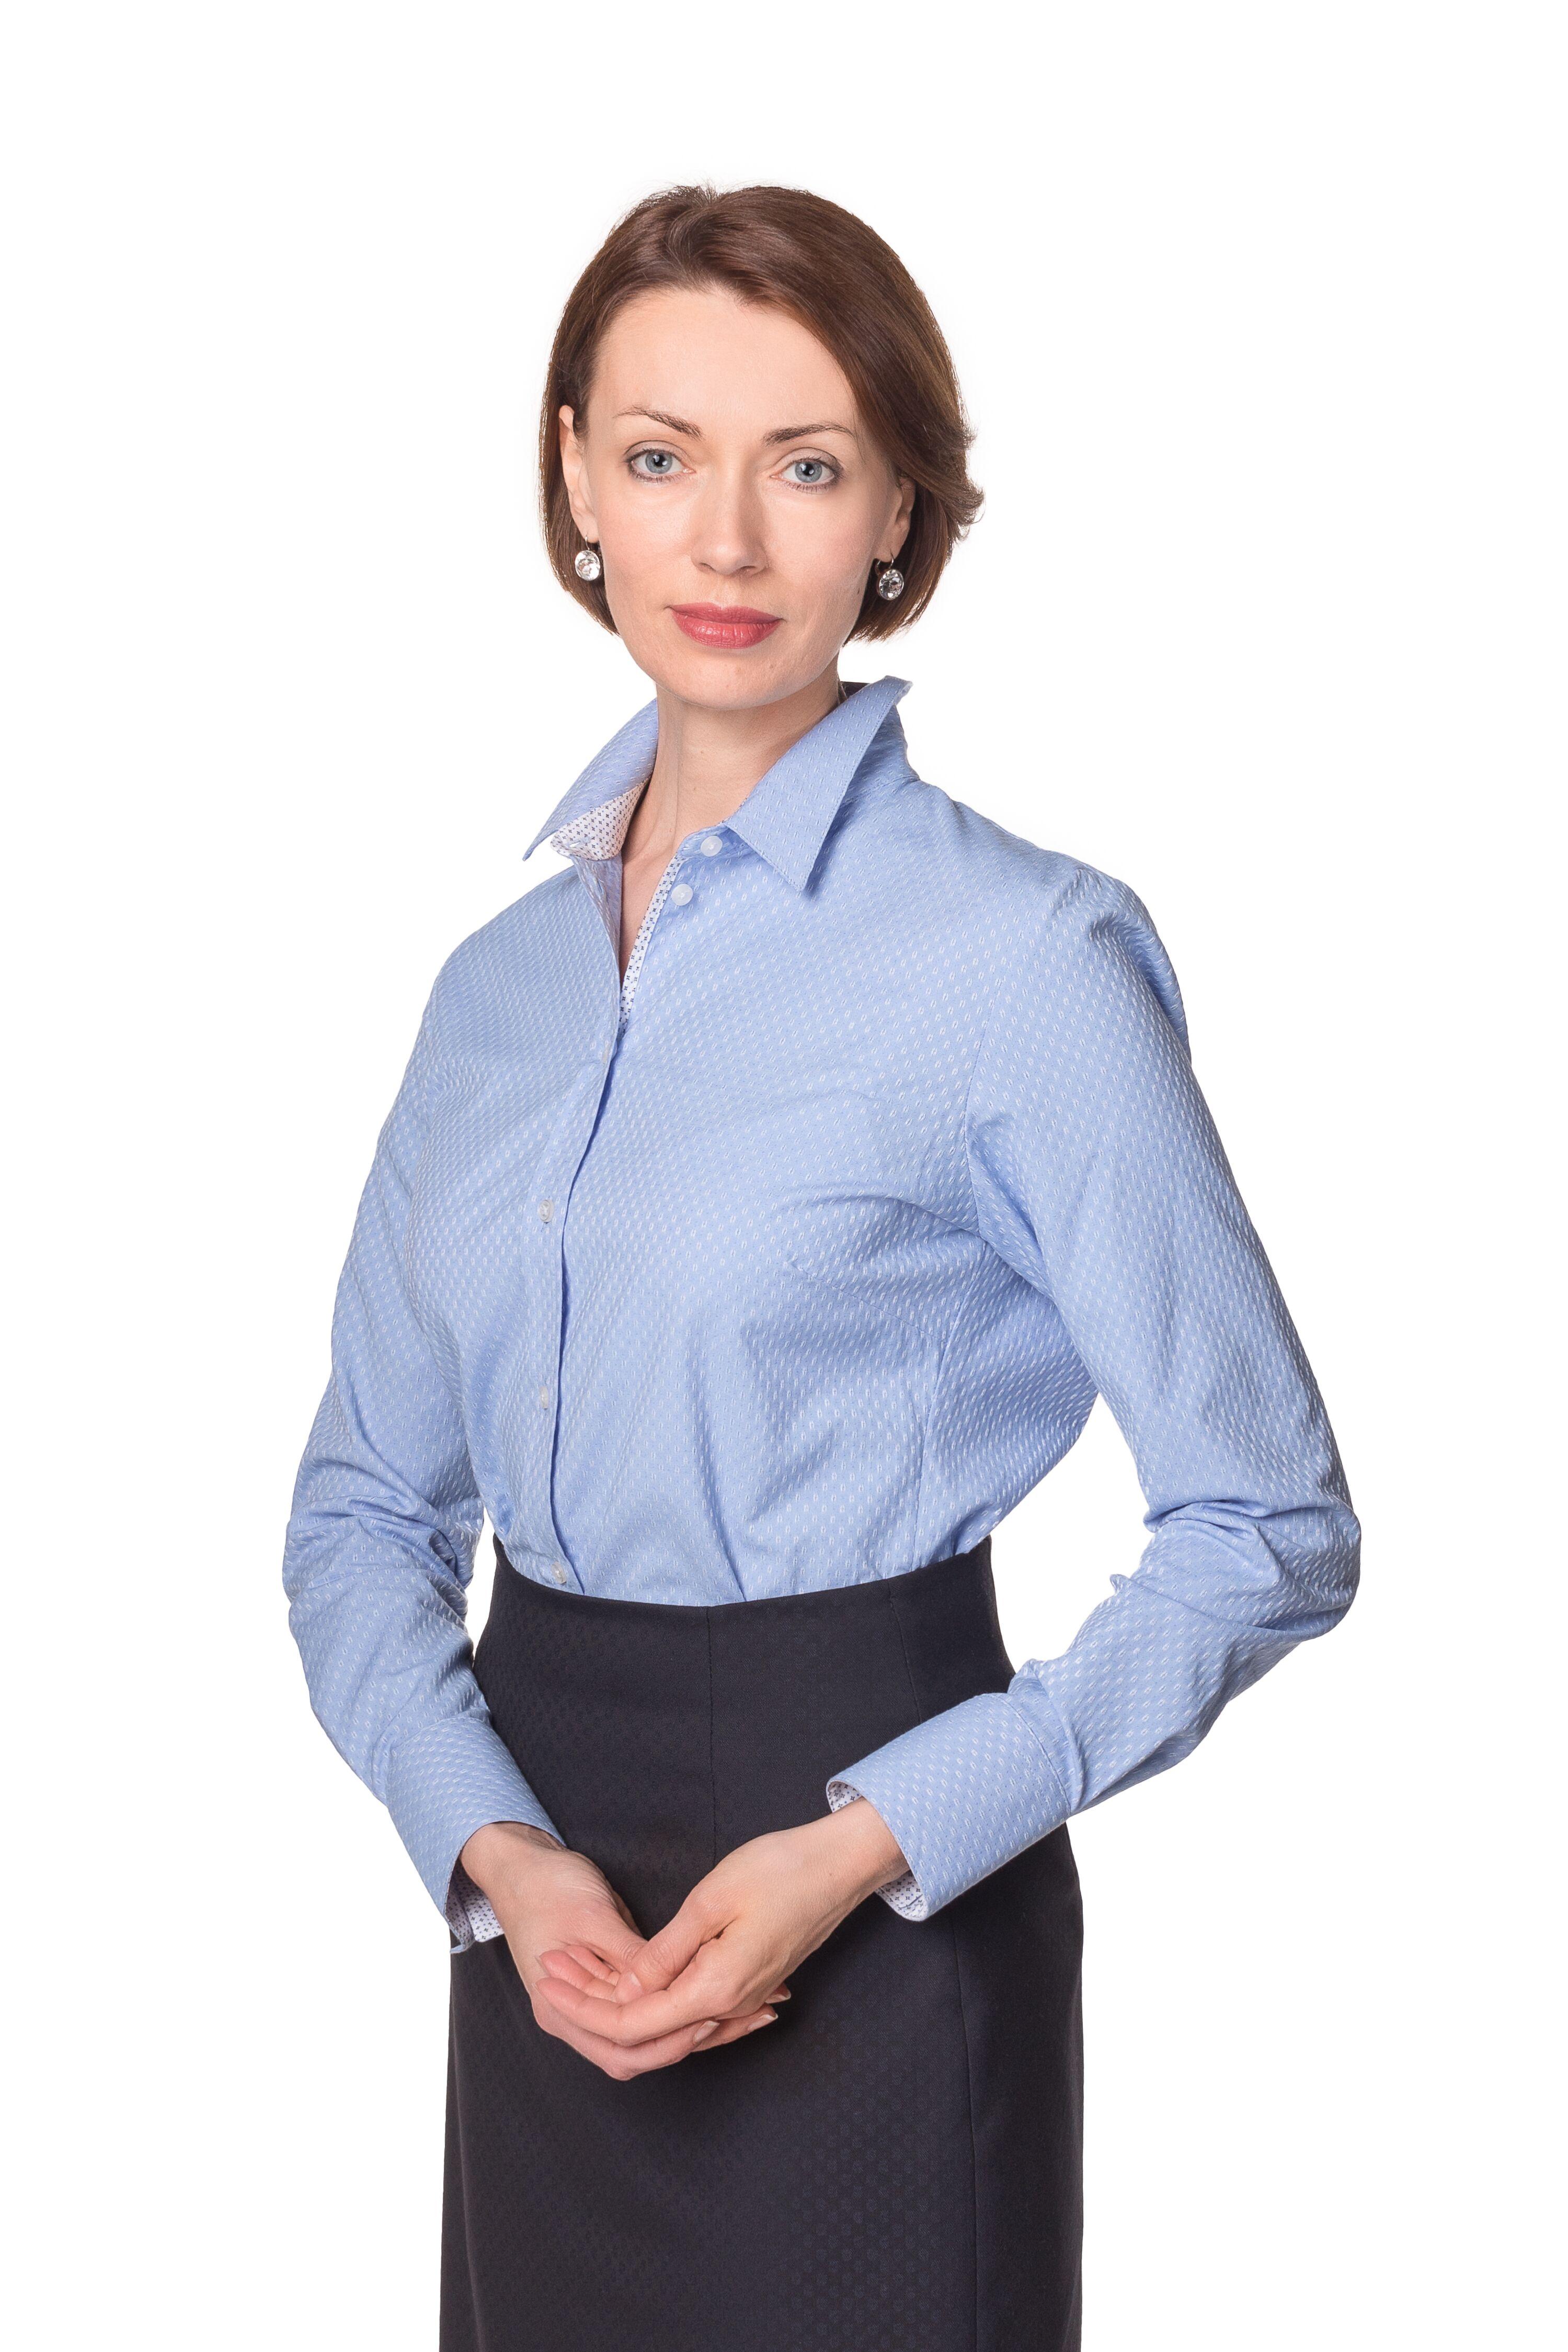 Viktoria Palgi Leinonen Accounting Manager